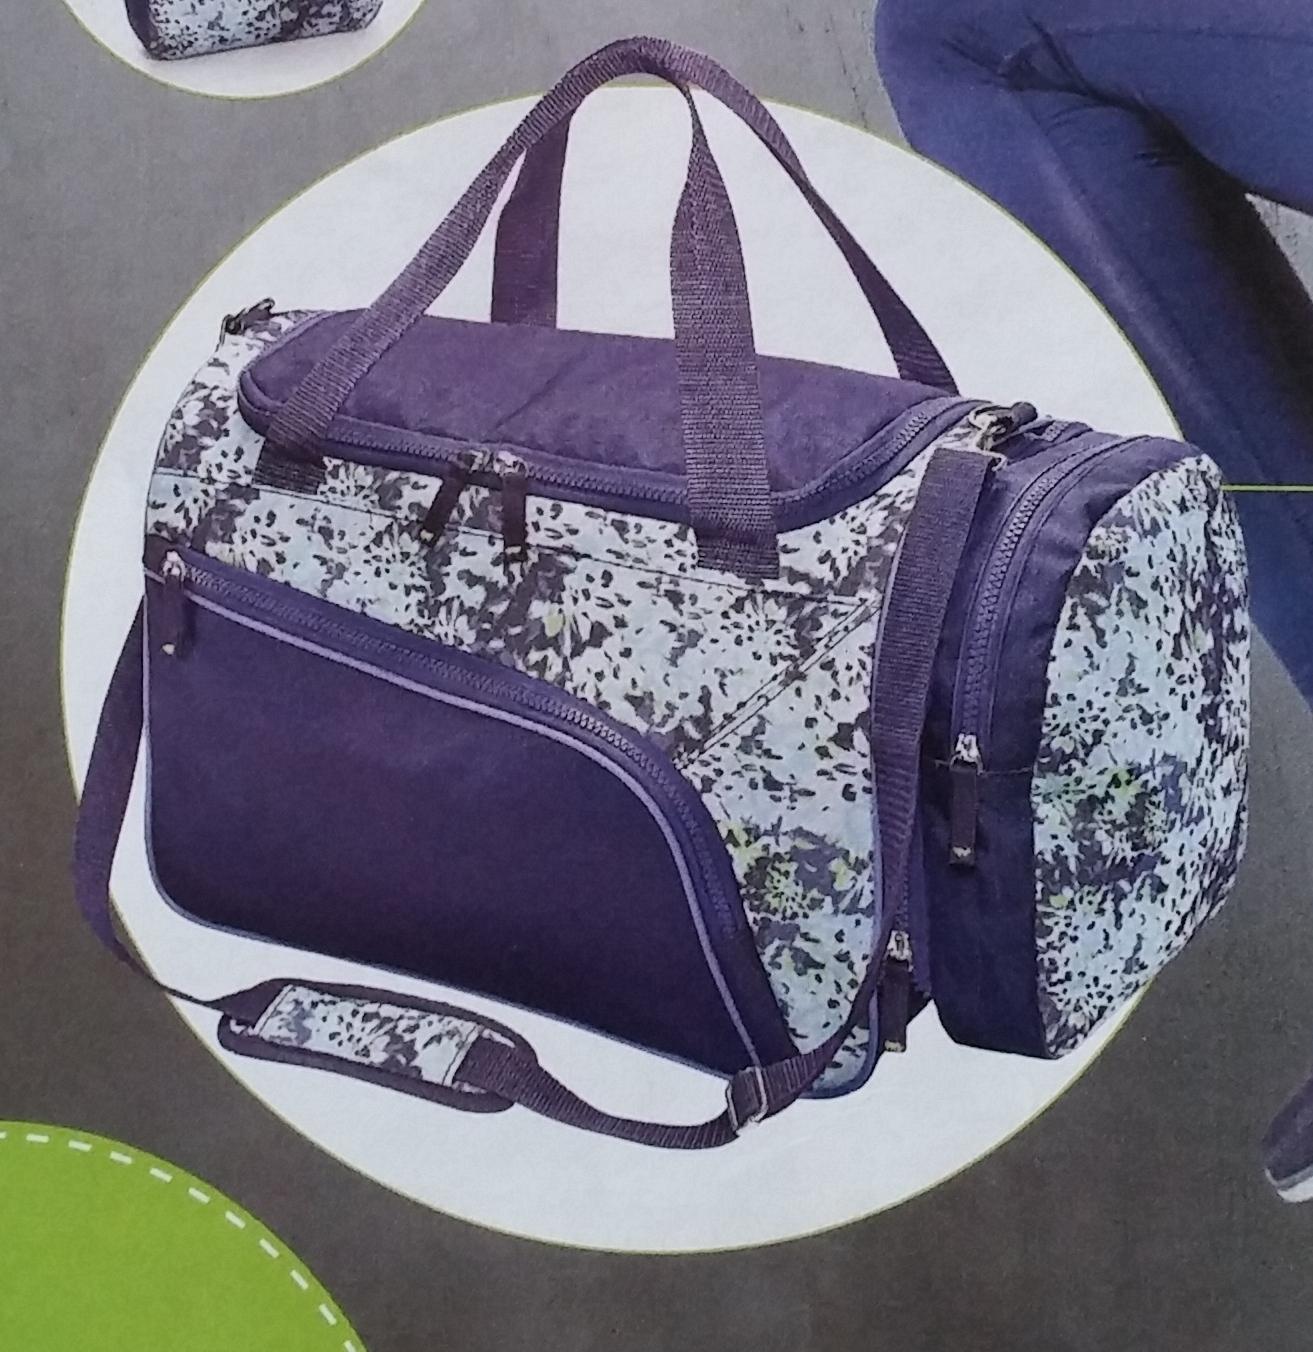 дорожная сумка эйвон фото столп